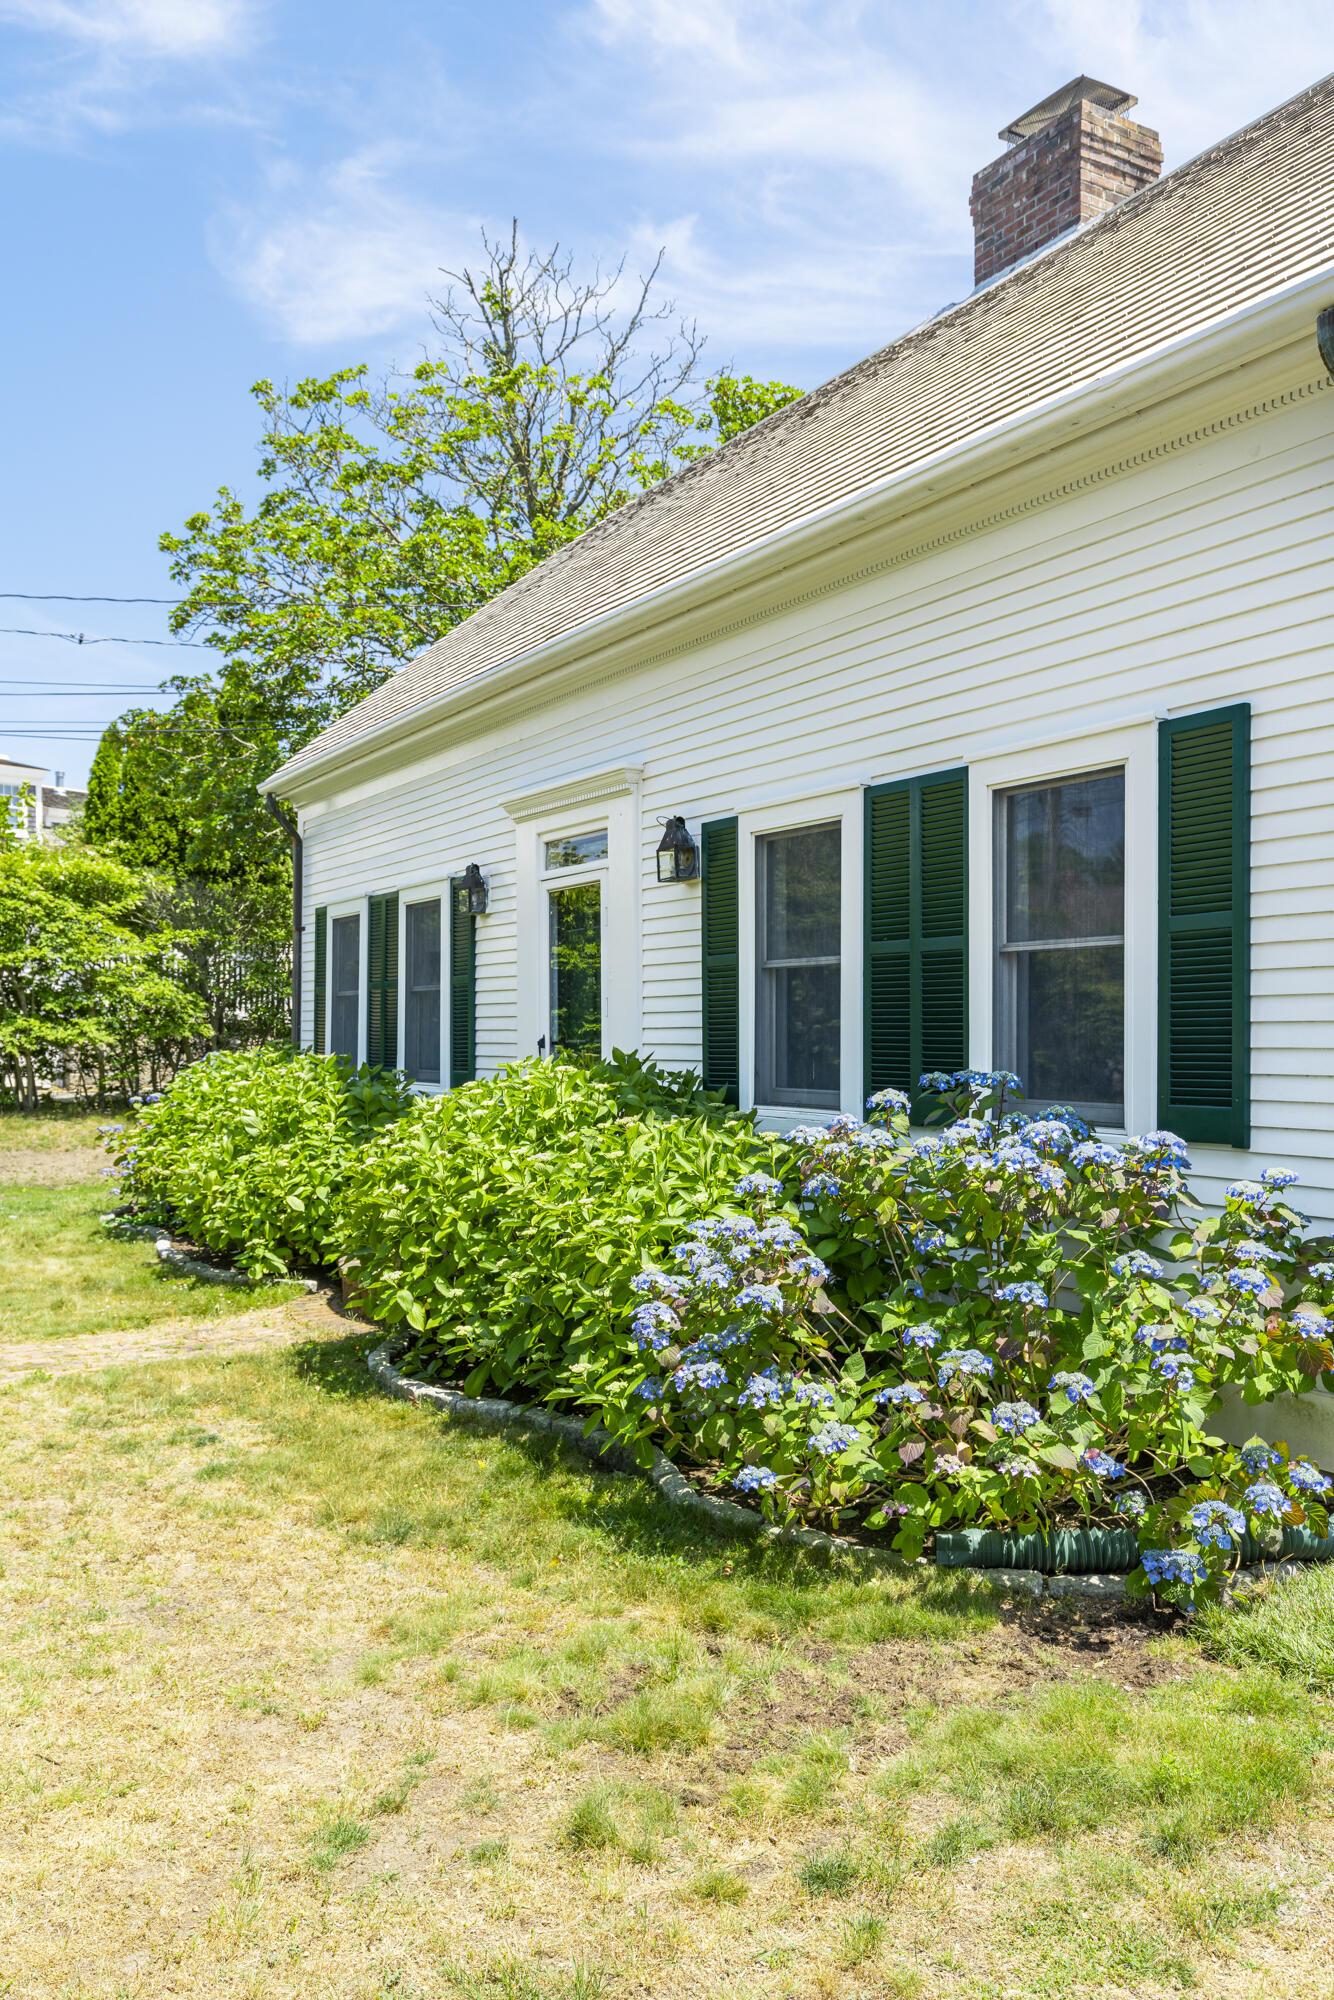 90 Seaview Street, Chatham, MA  02633 - slide 50